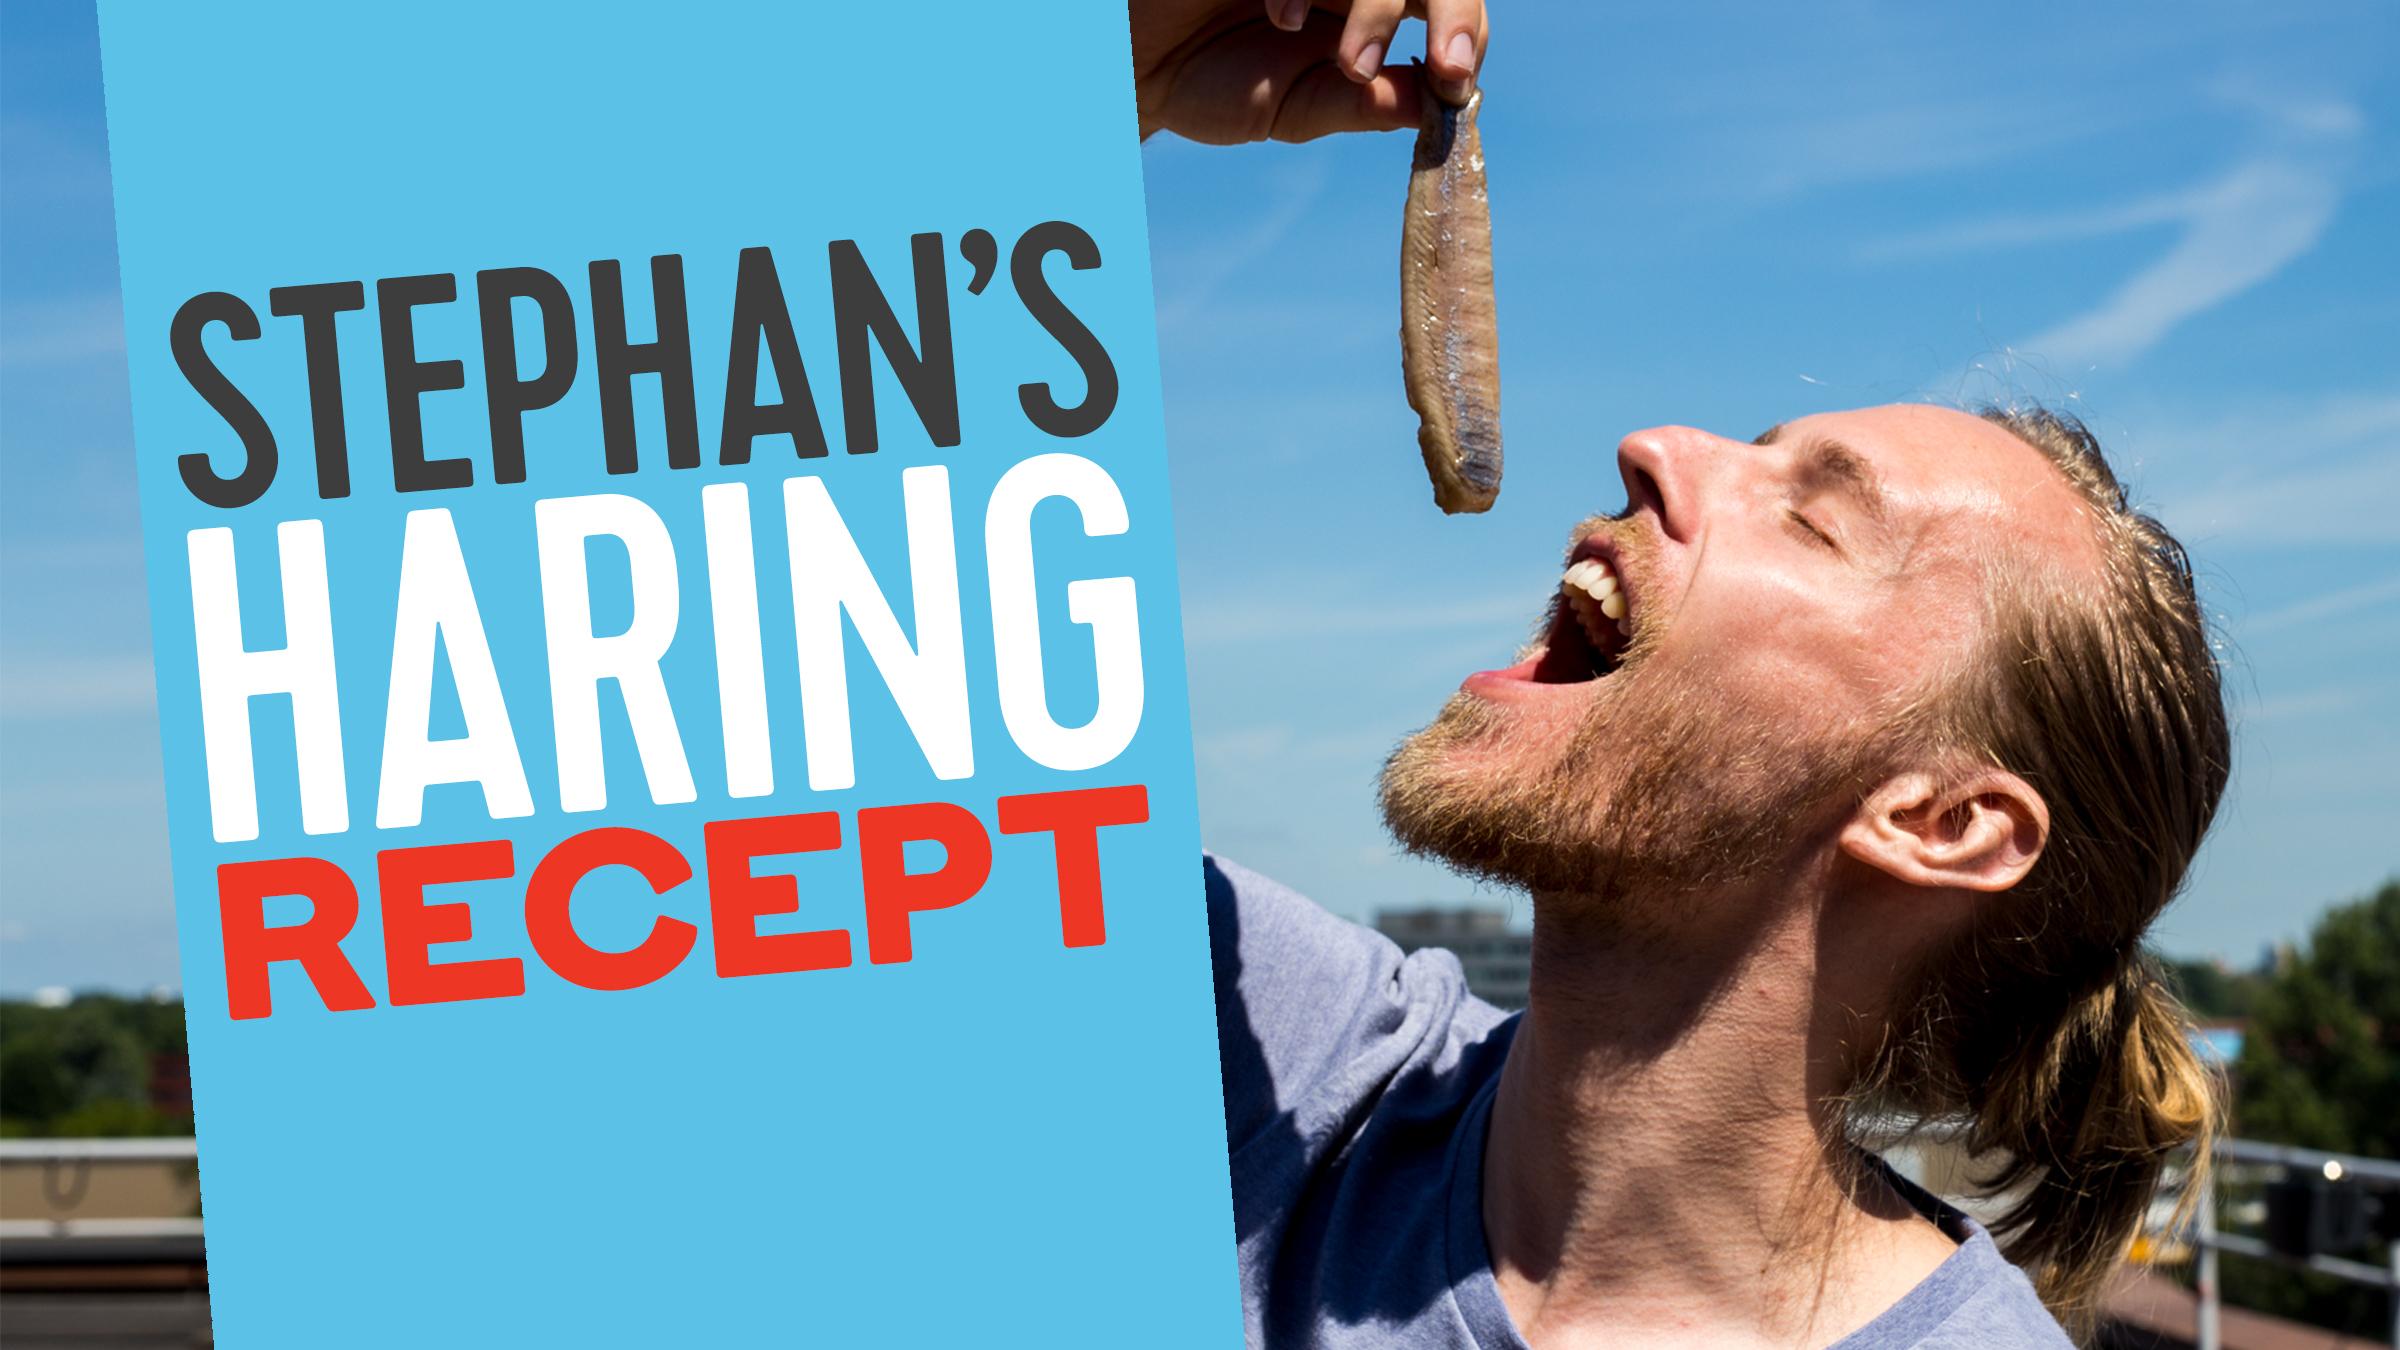 Stephanharing teaser